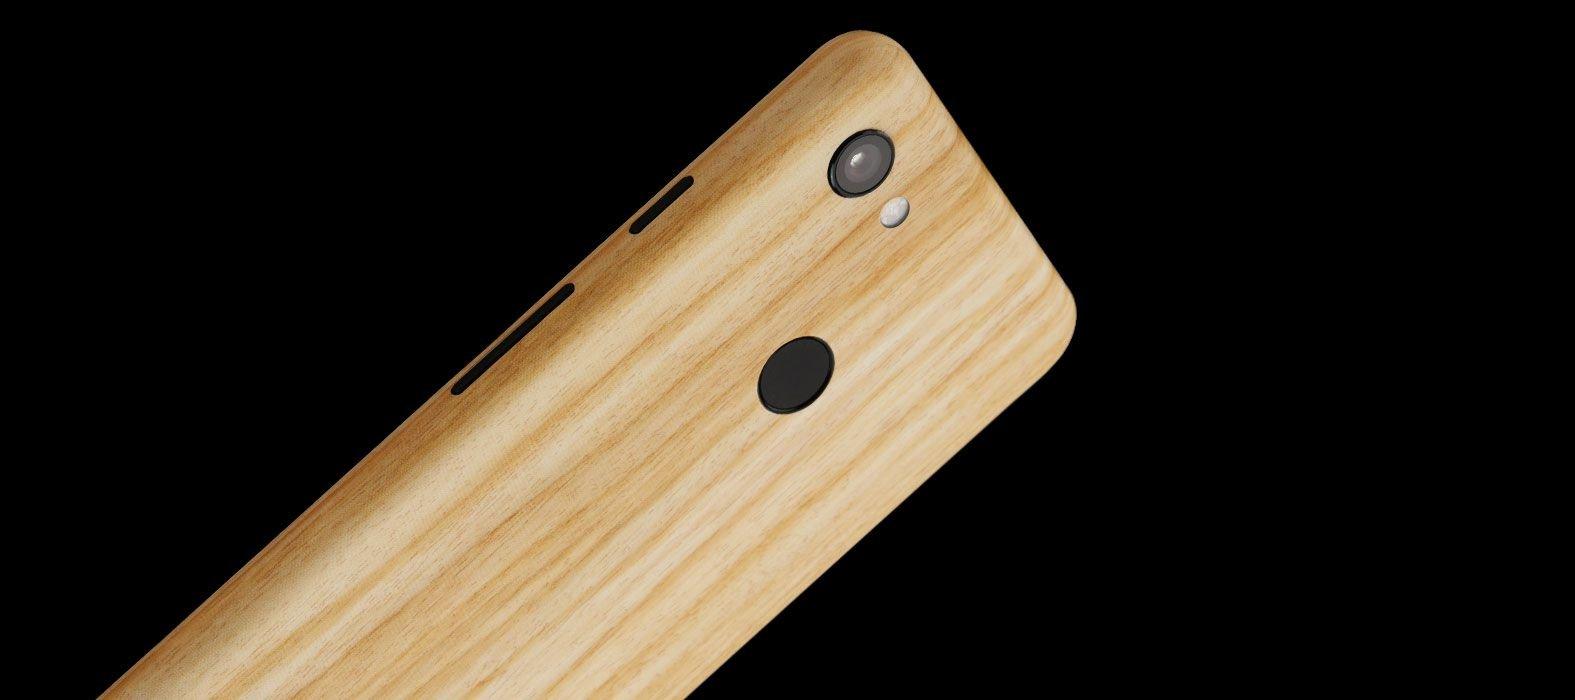 Pixel-3a-Bamboo-wood-skins